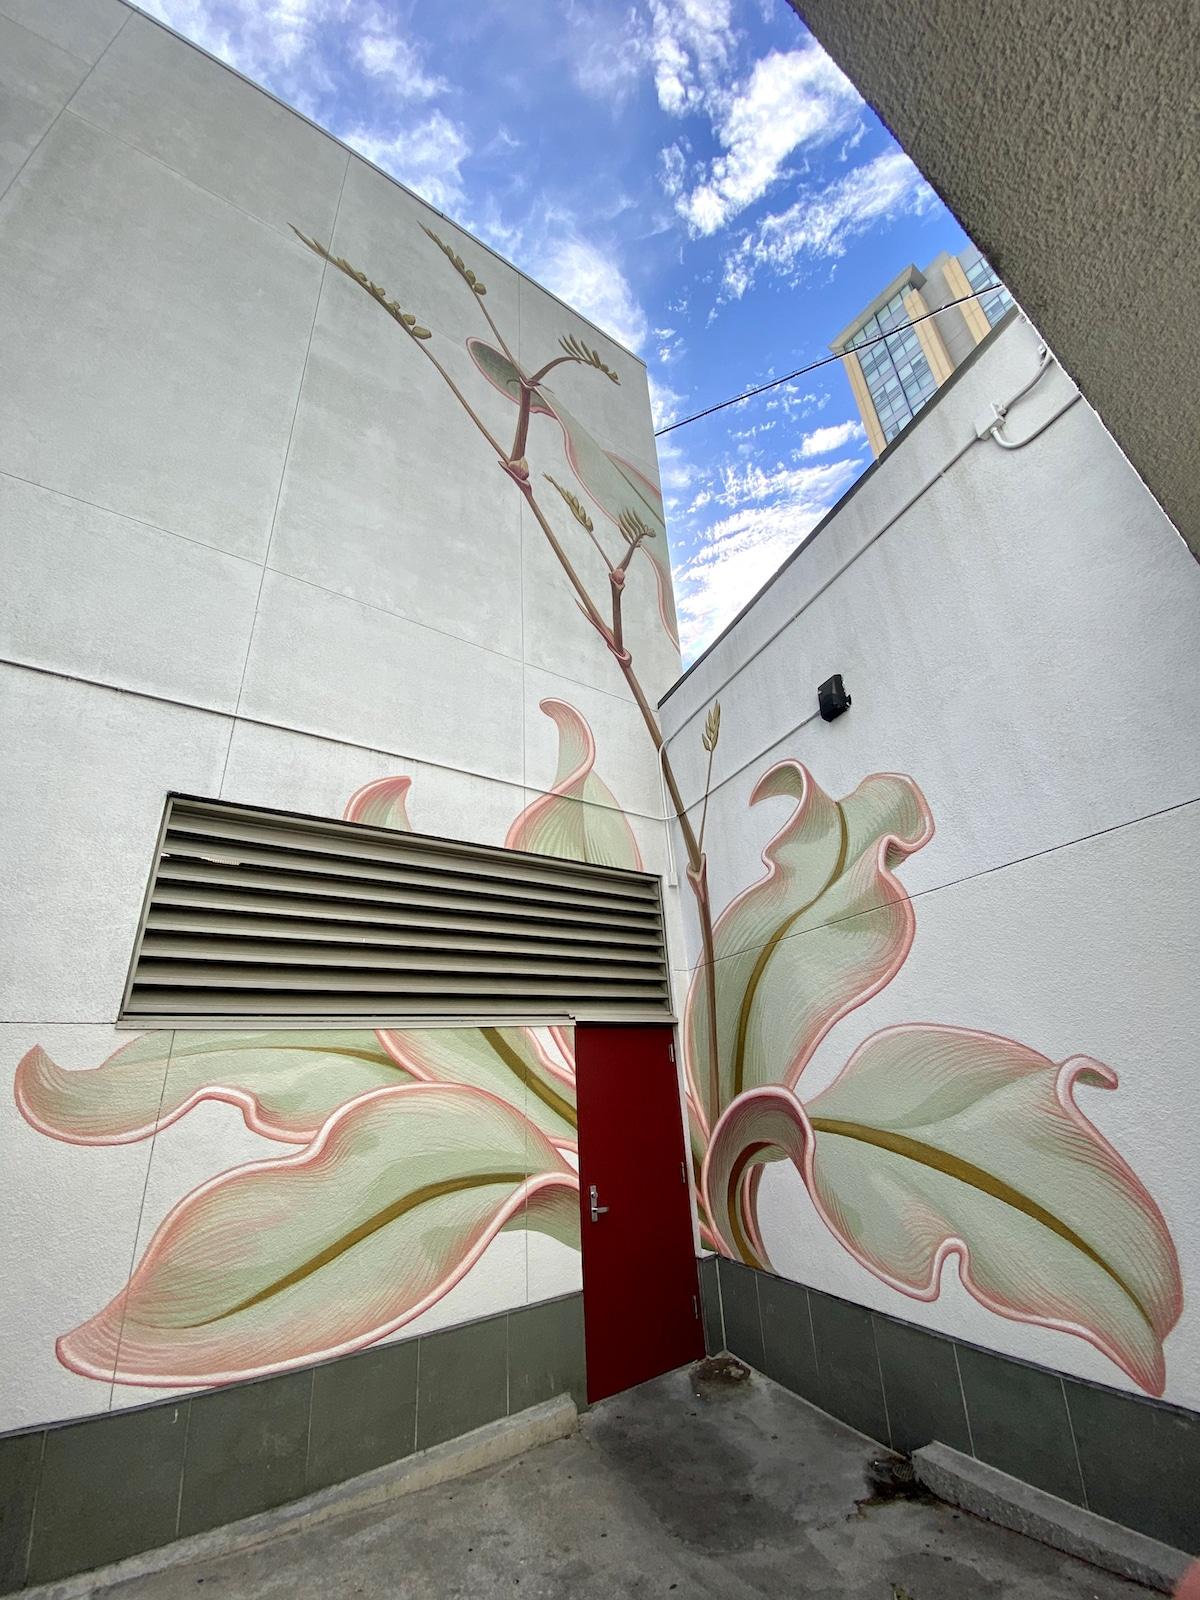 Flower Mural by Mona Caron